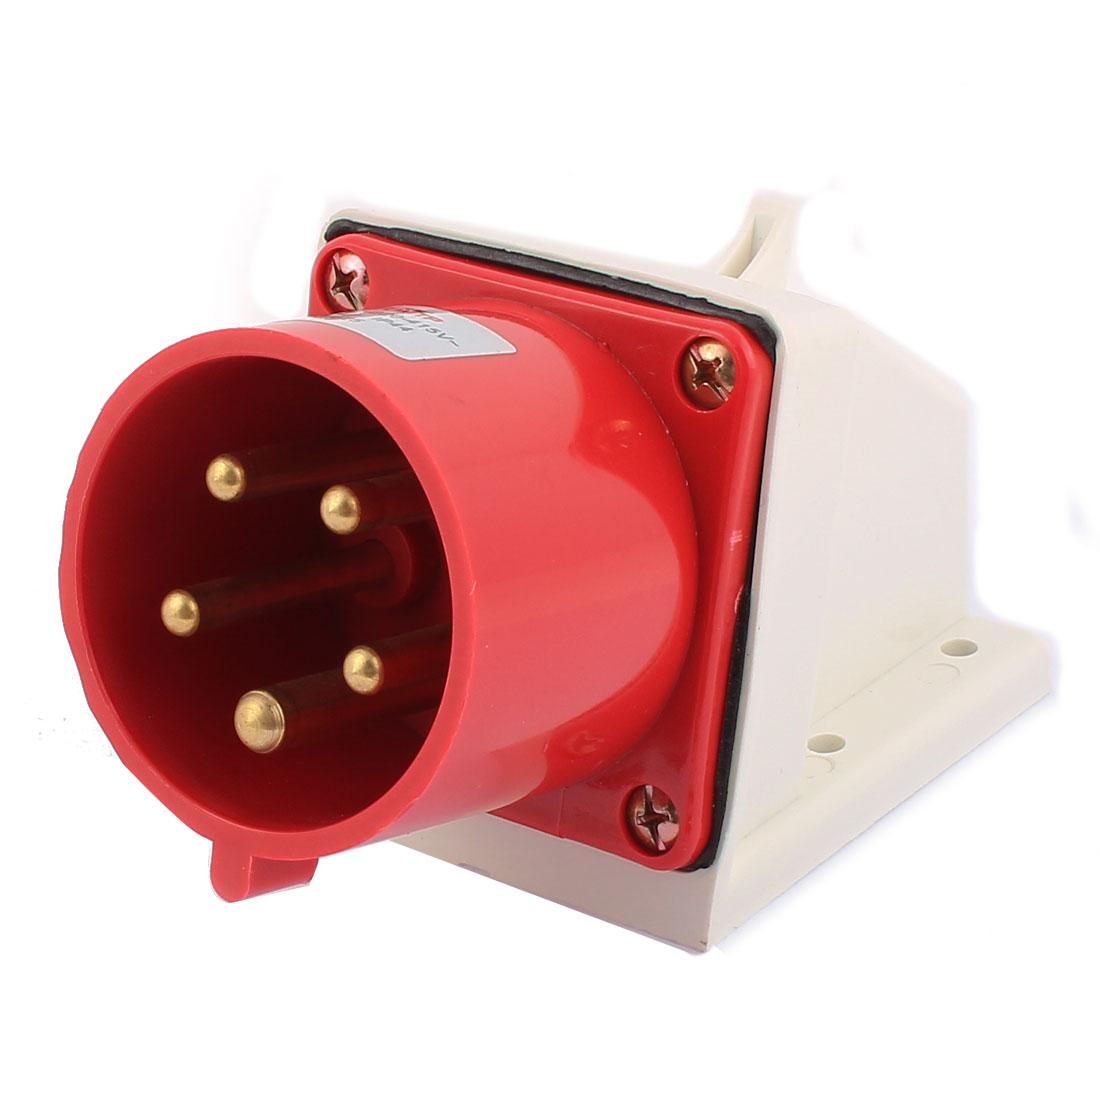 AC 220V-415V 32A IP44 3P+N+E 5-Terminal Male Industrial Caravan Panel Plug